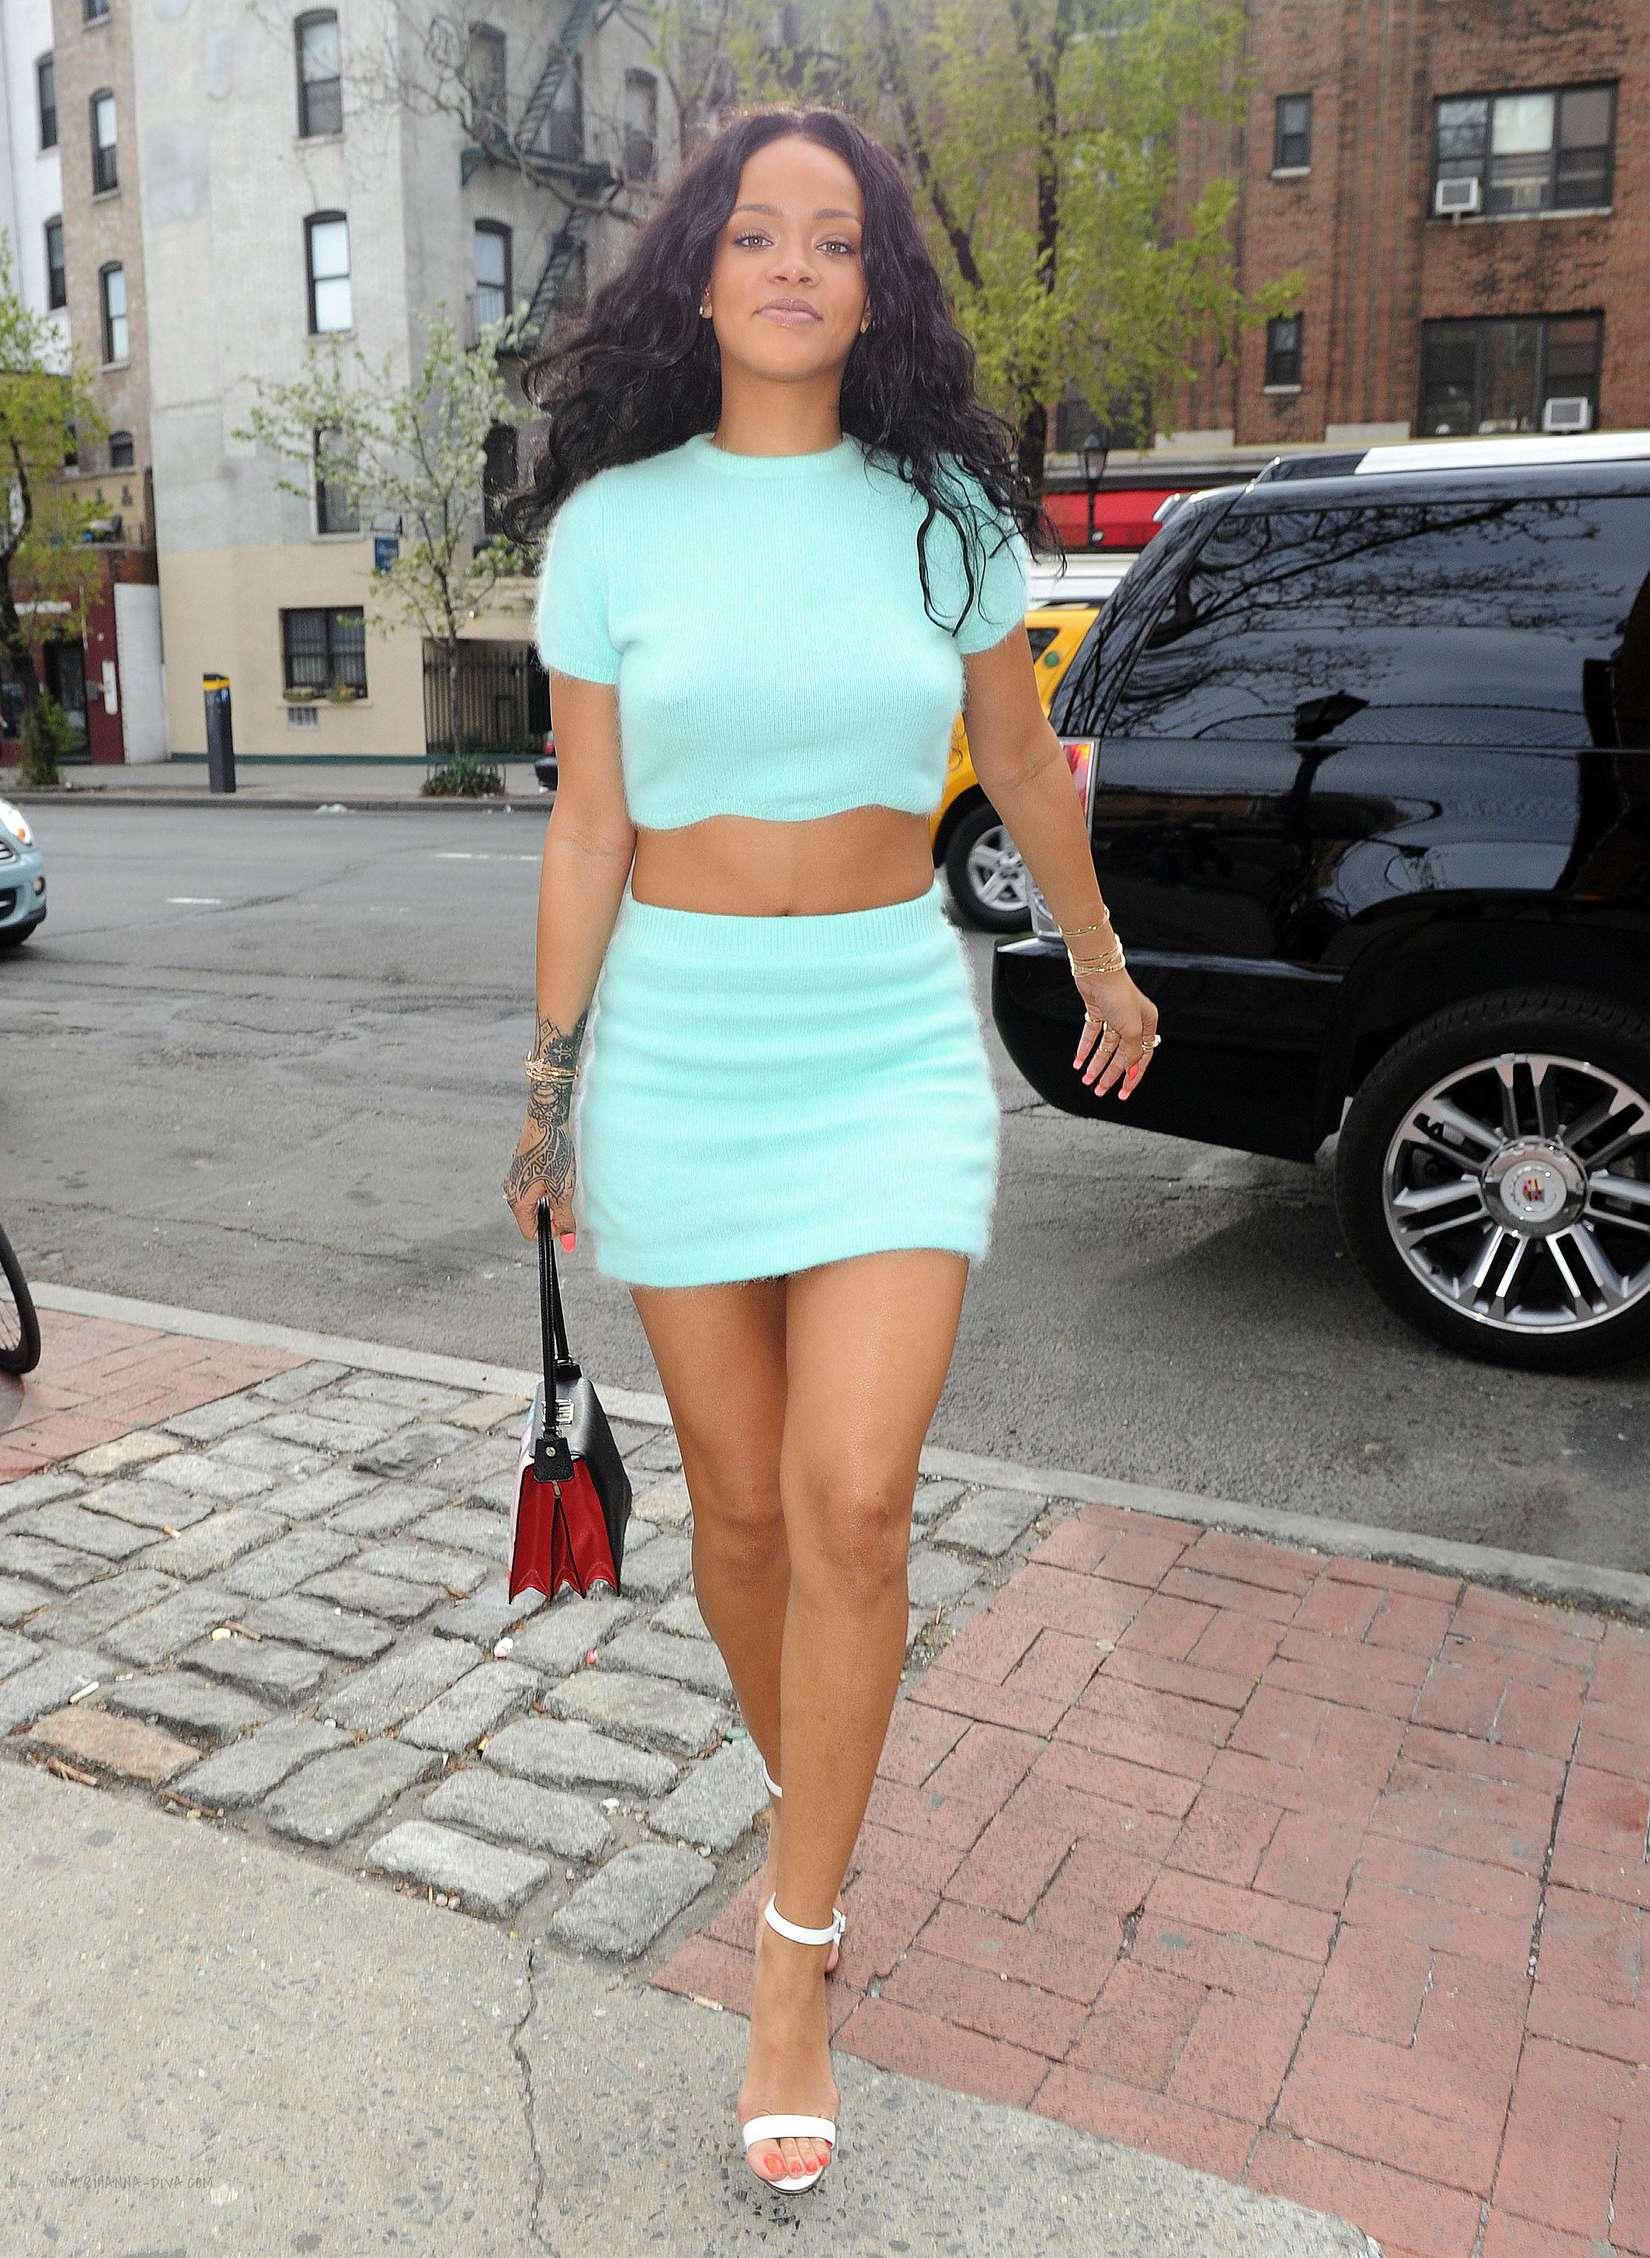 Rihanna in a skirt